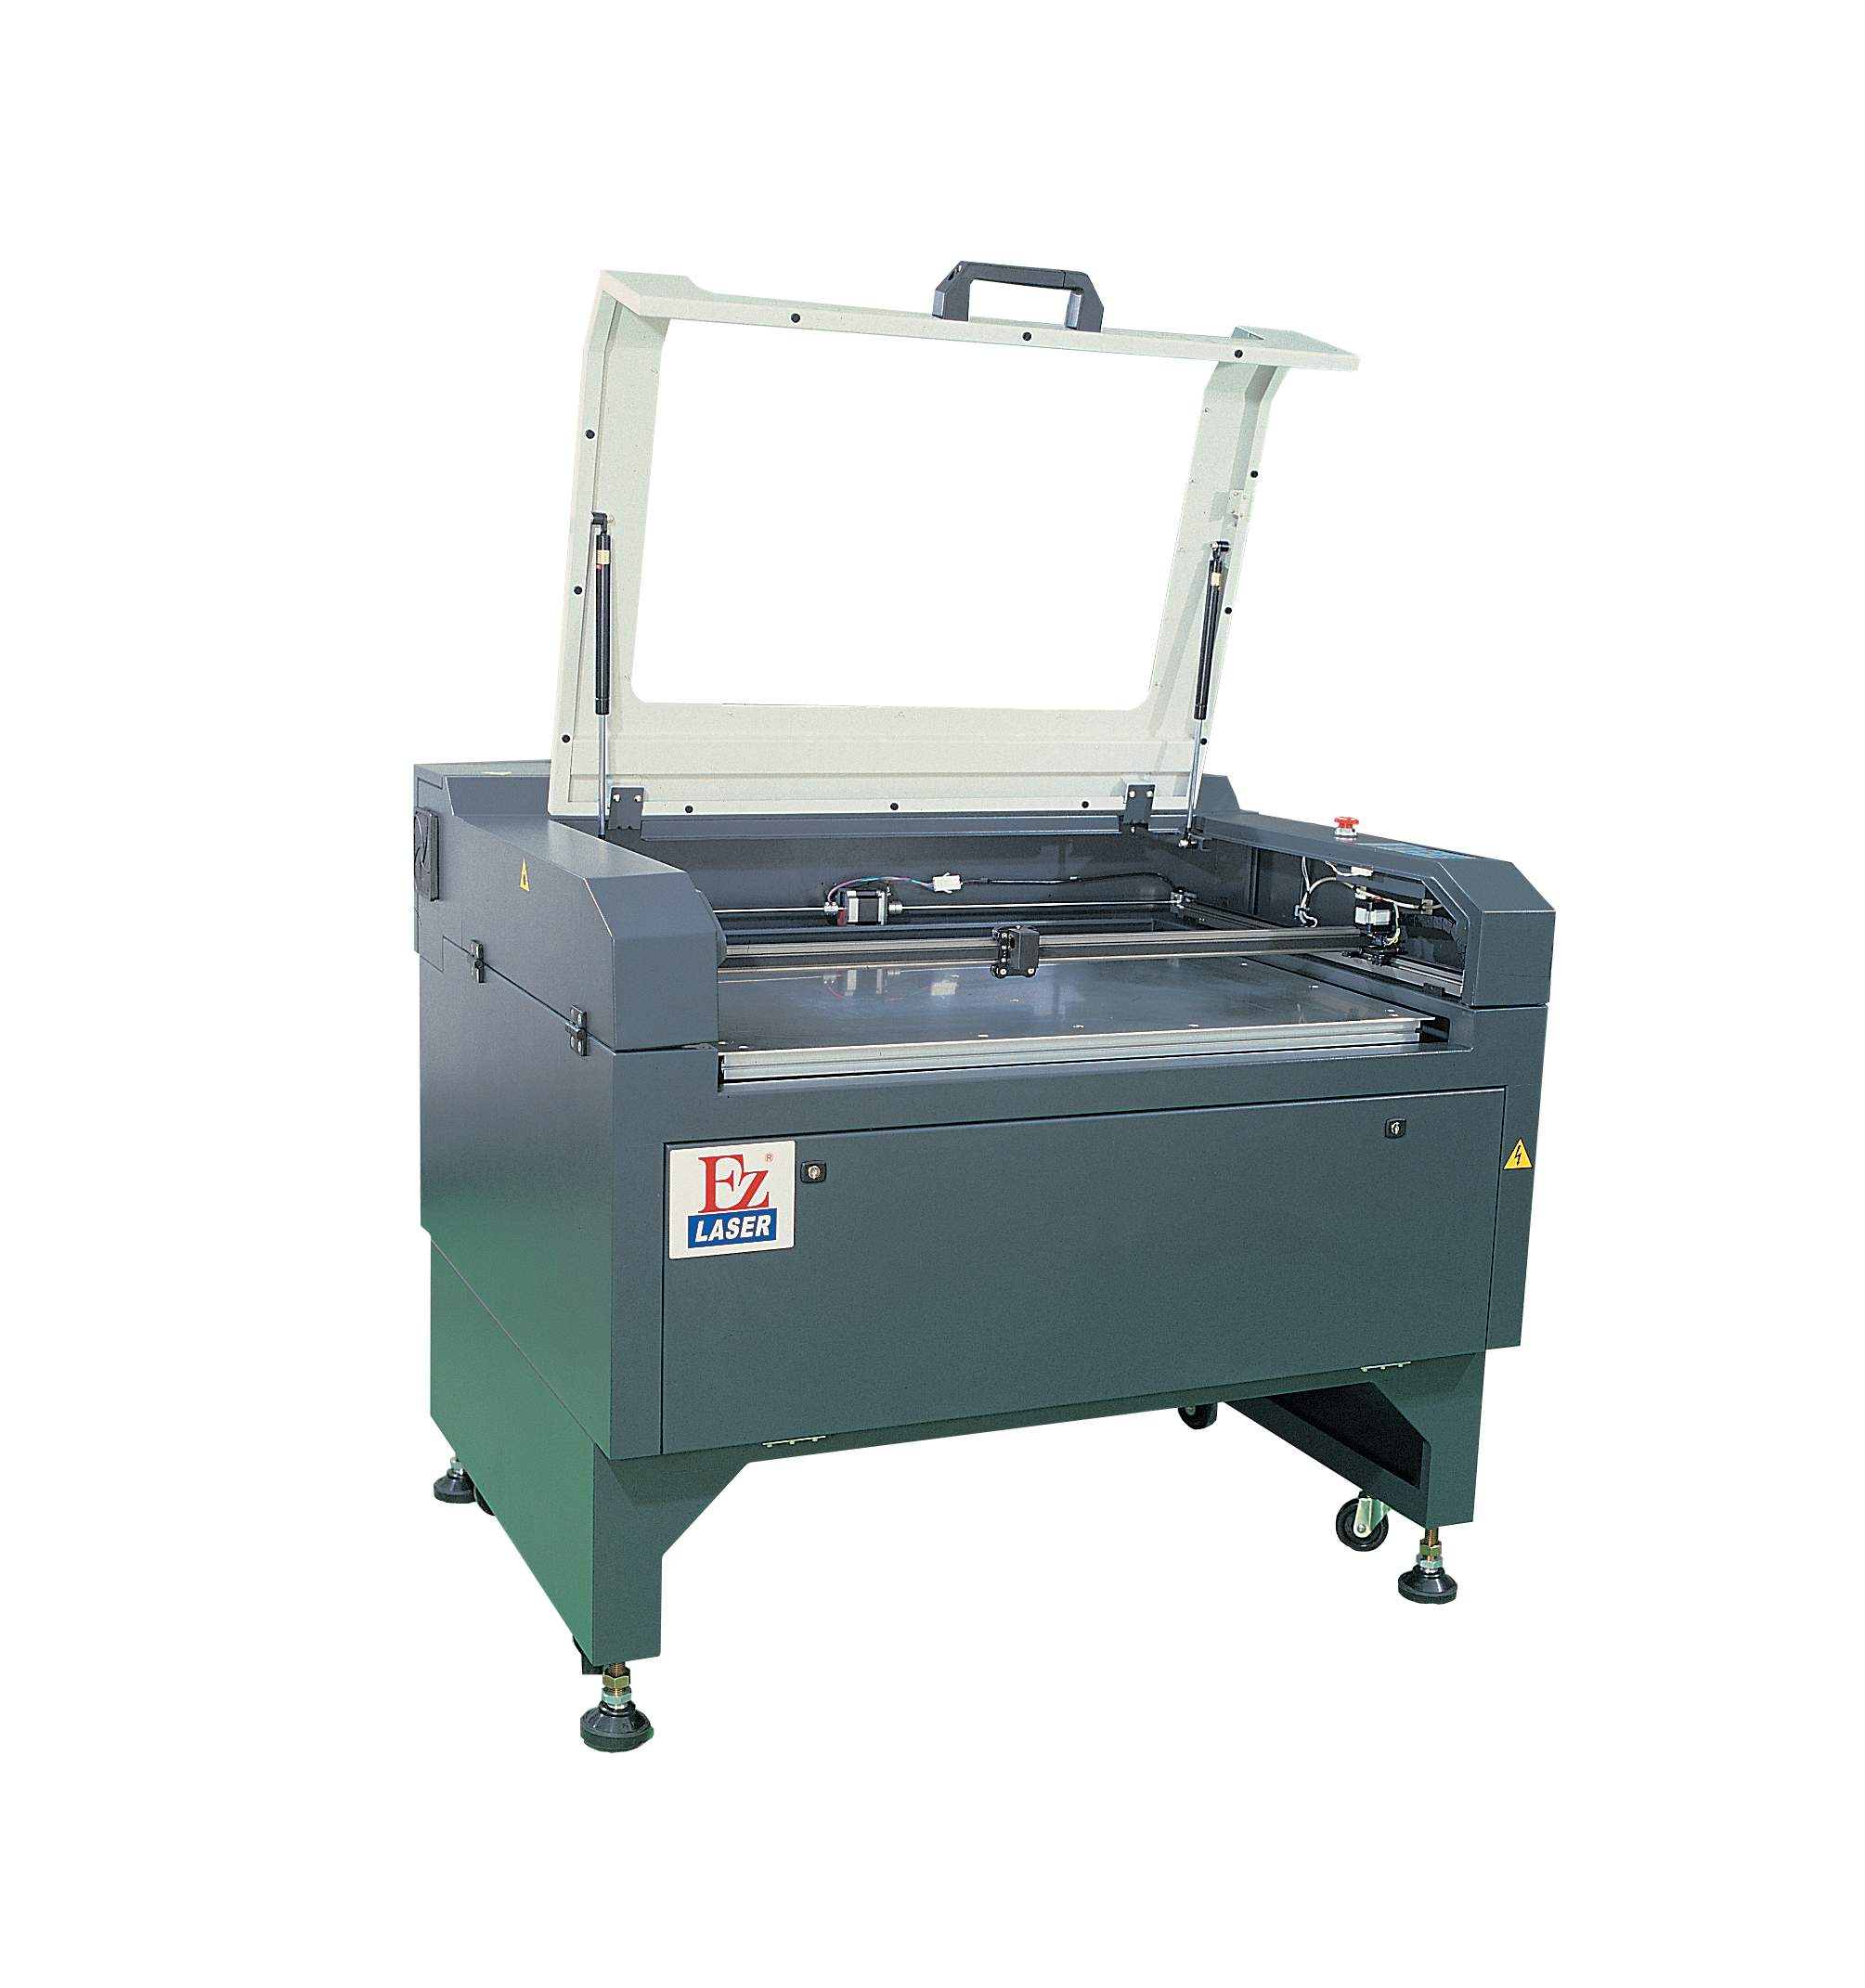 Laser Engraving Machine, Laser Engraver, Laser Engraving System